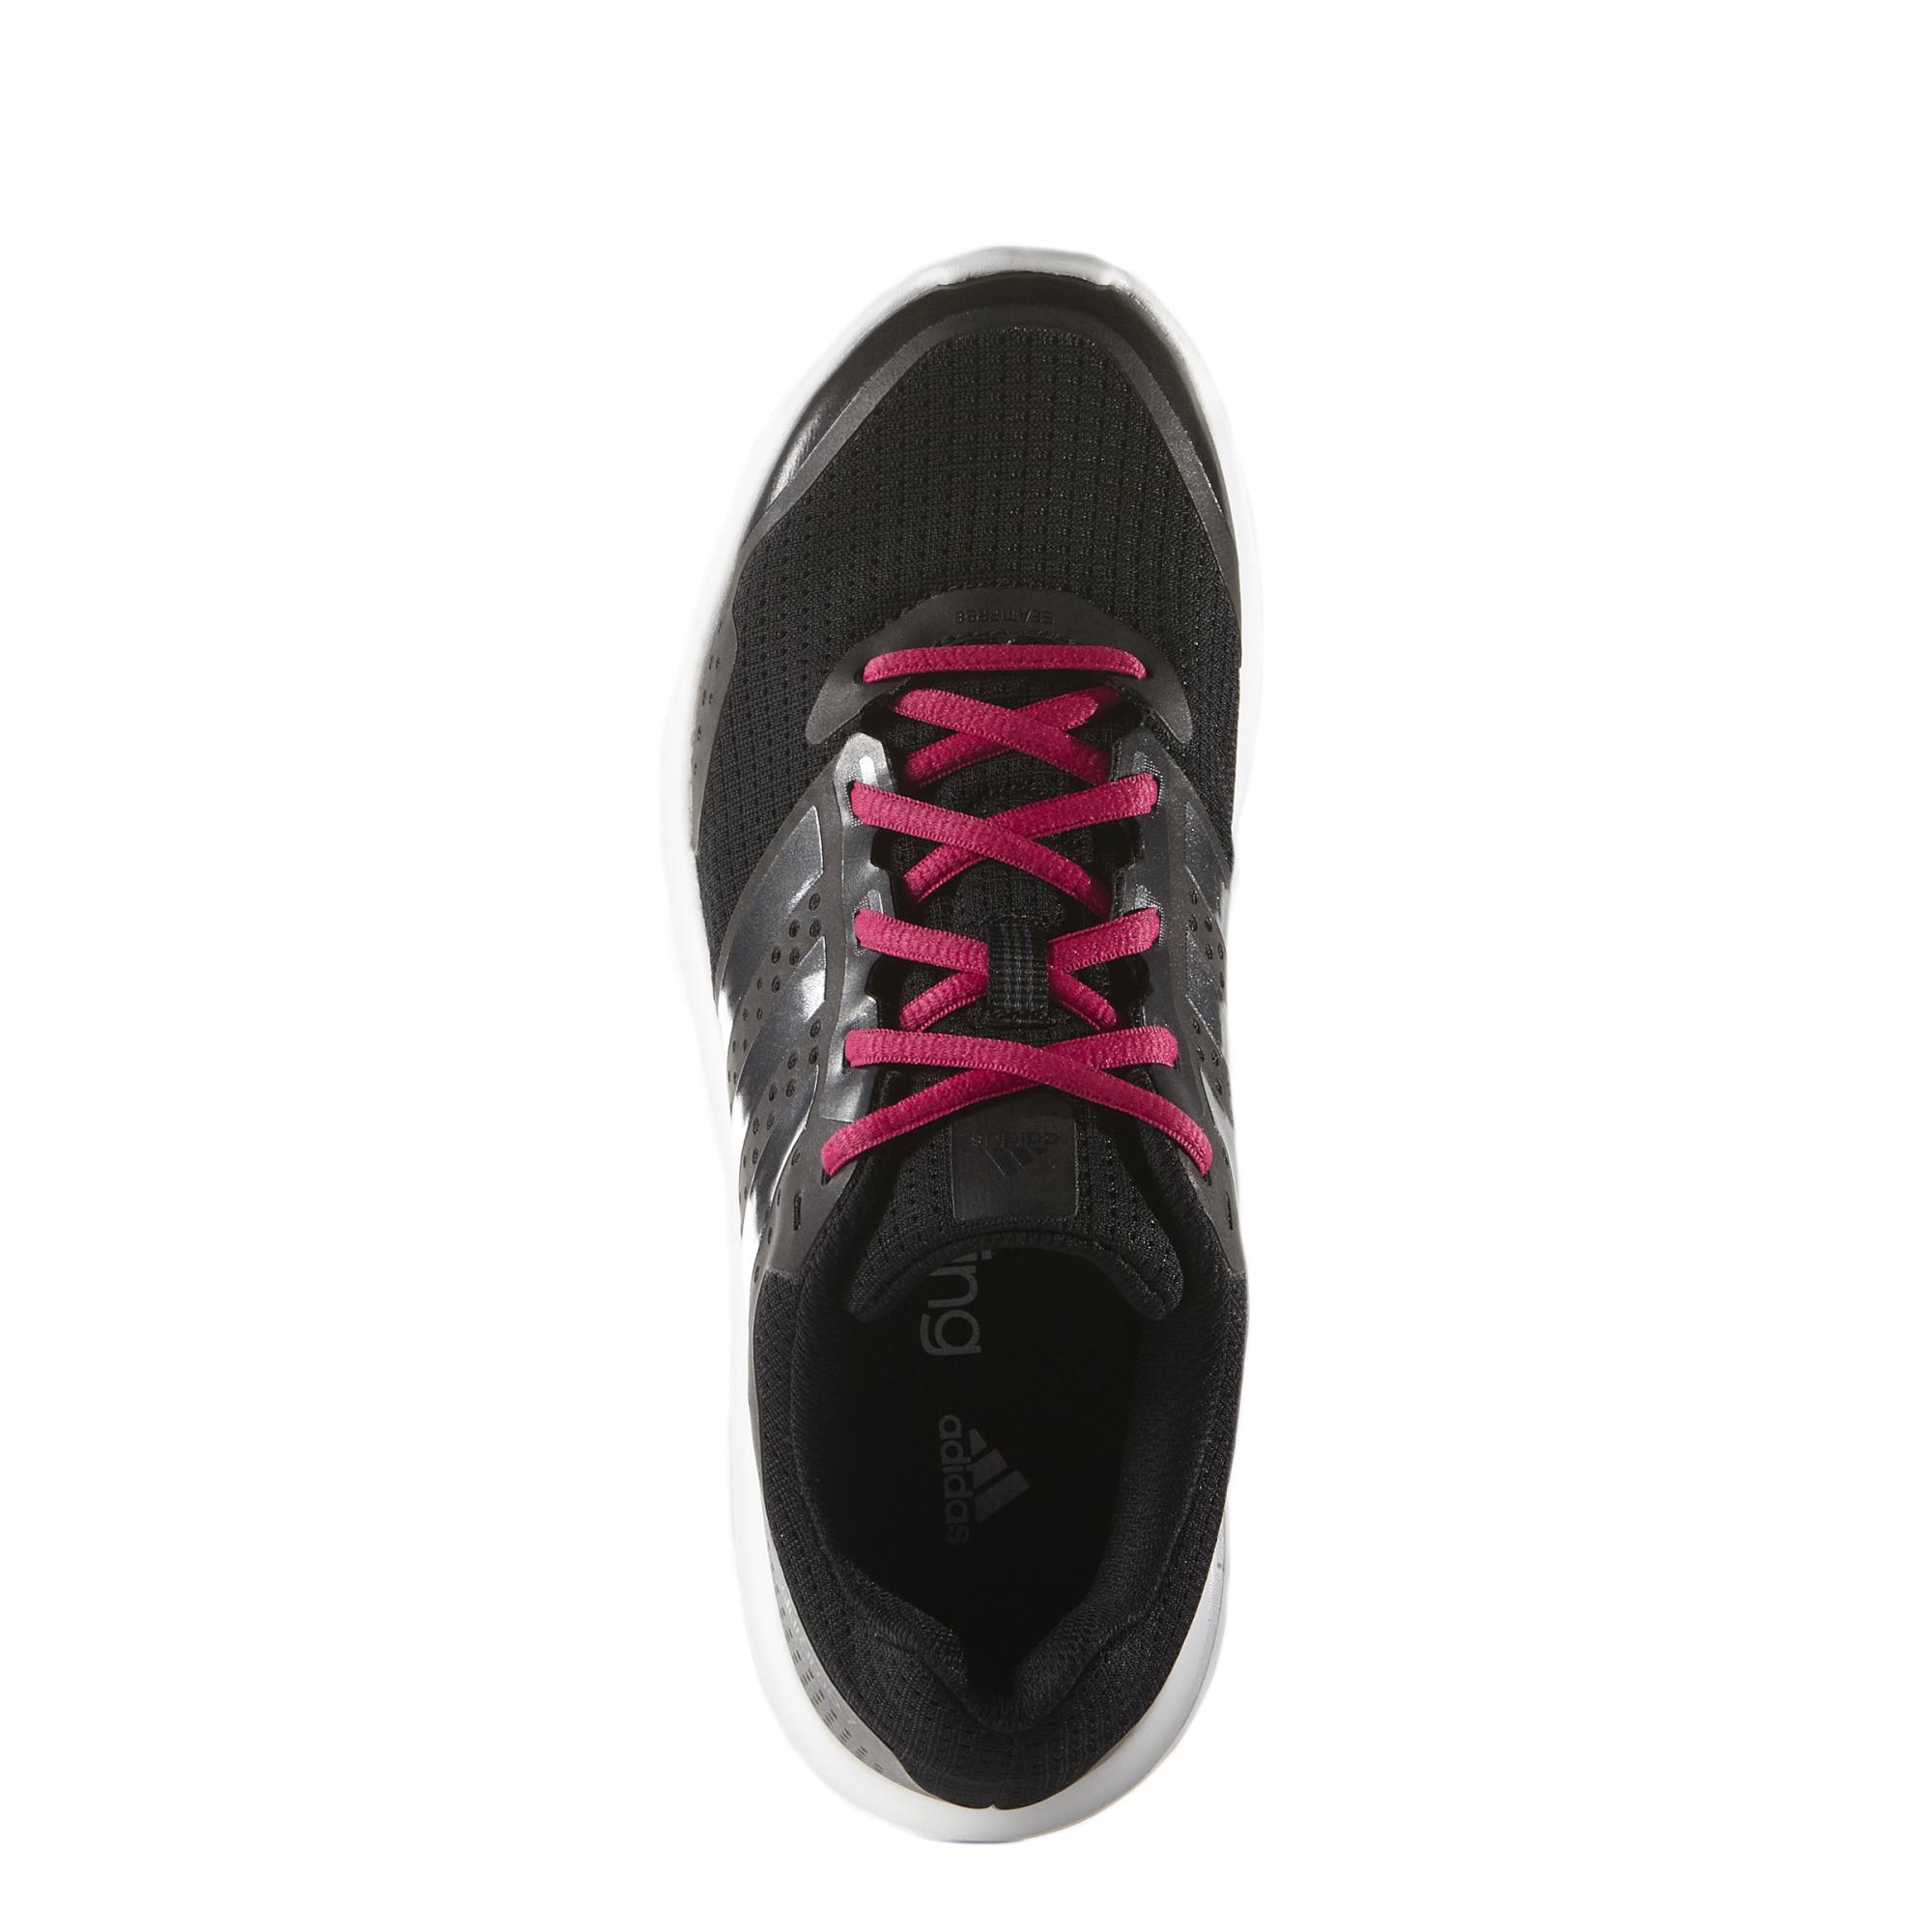 Adidas Duramo 7 W (negro blanco rosa) - manelsanchez.pt 7c7af4b9856fa